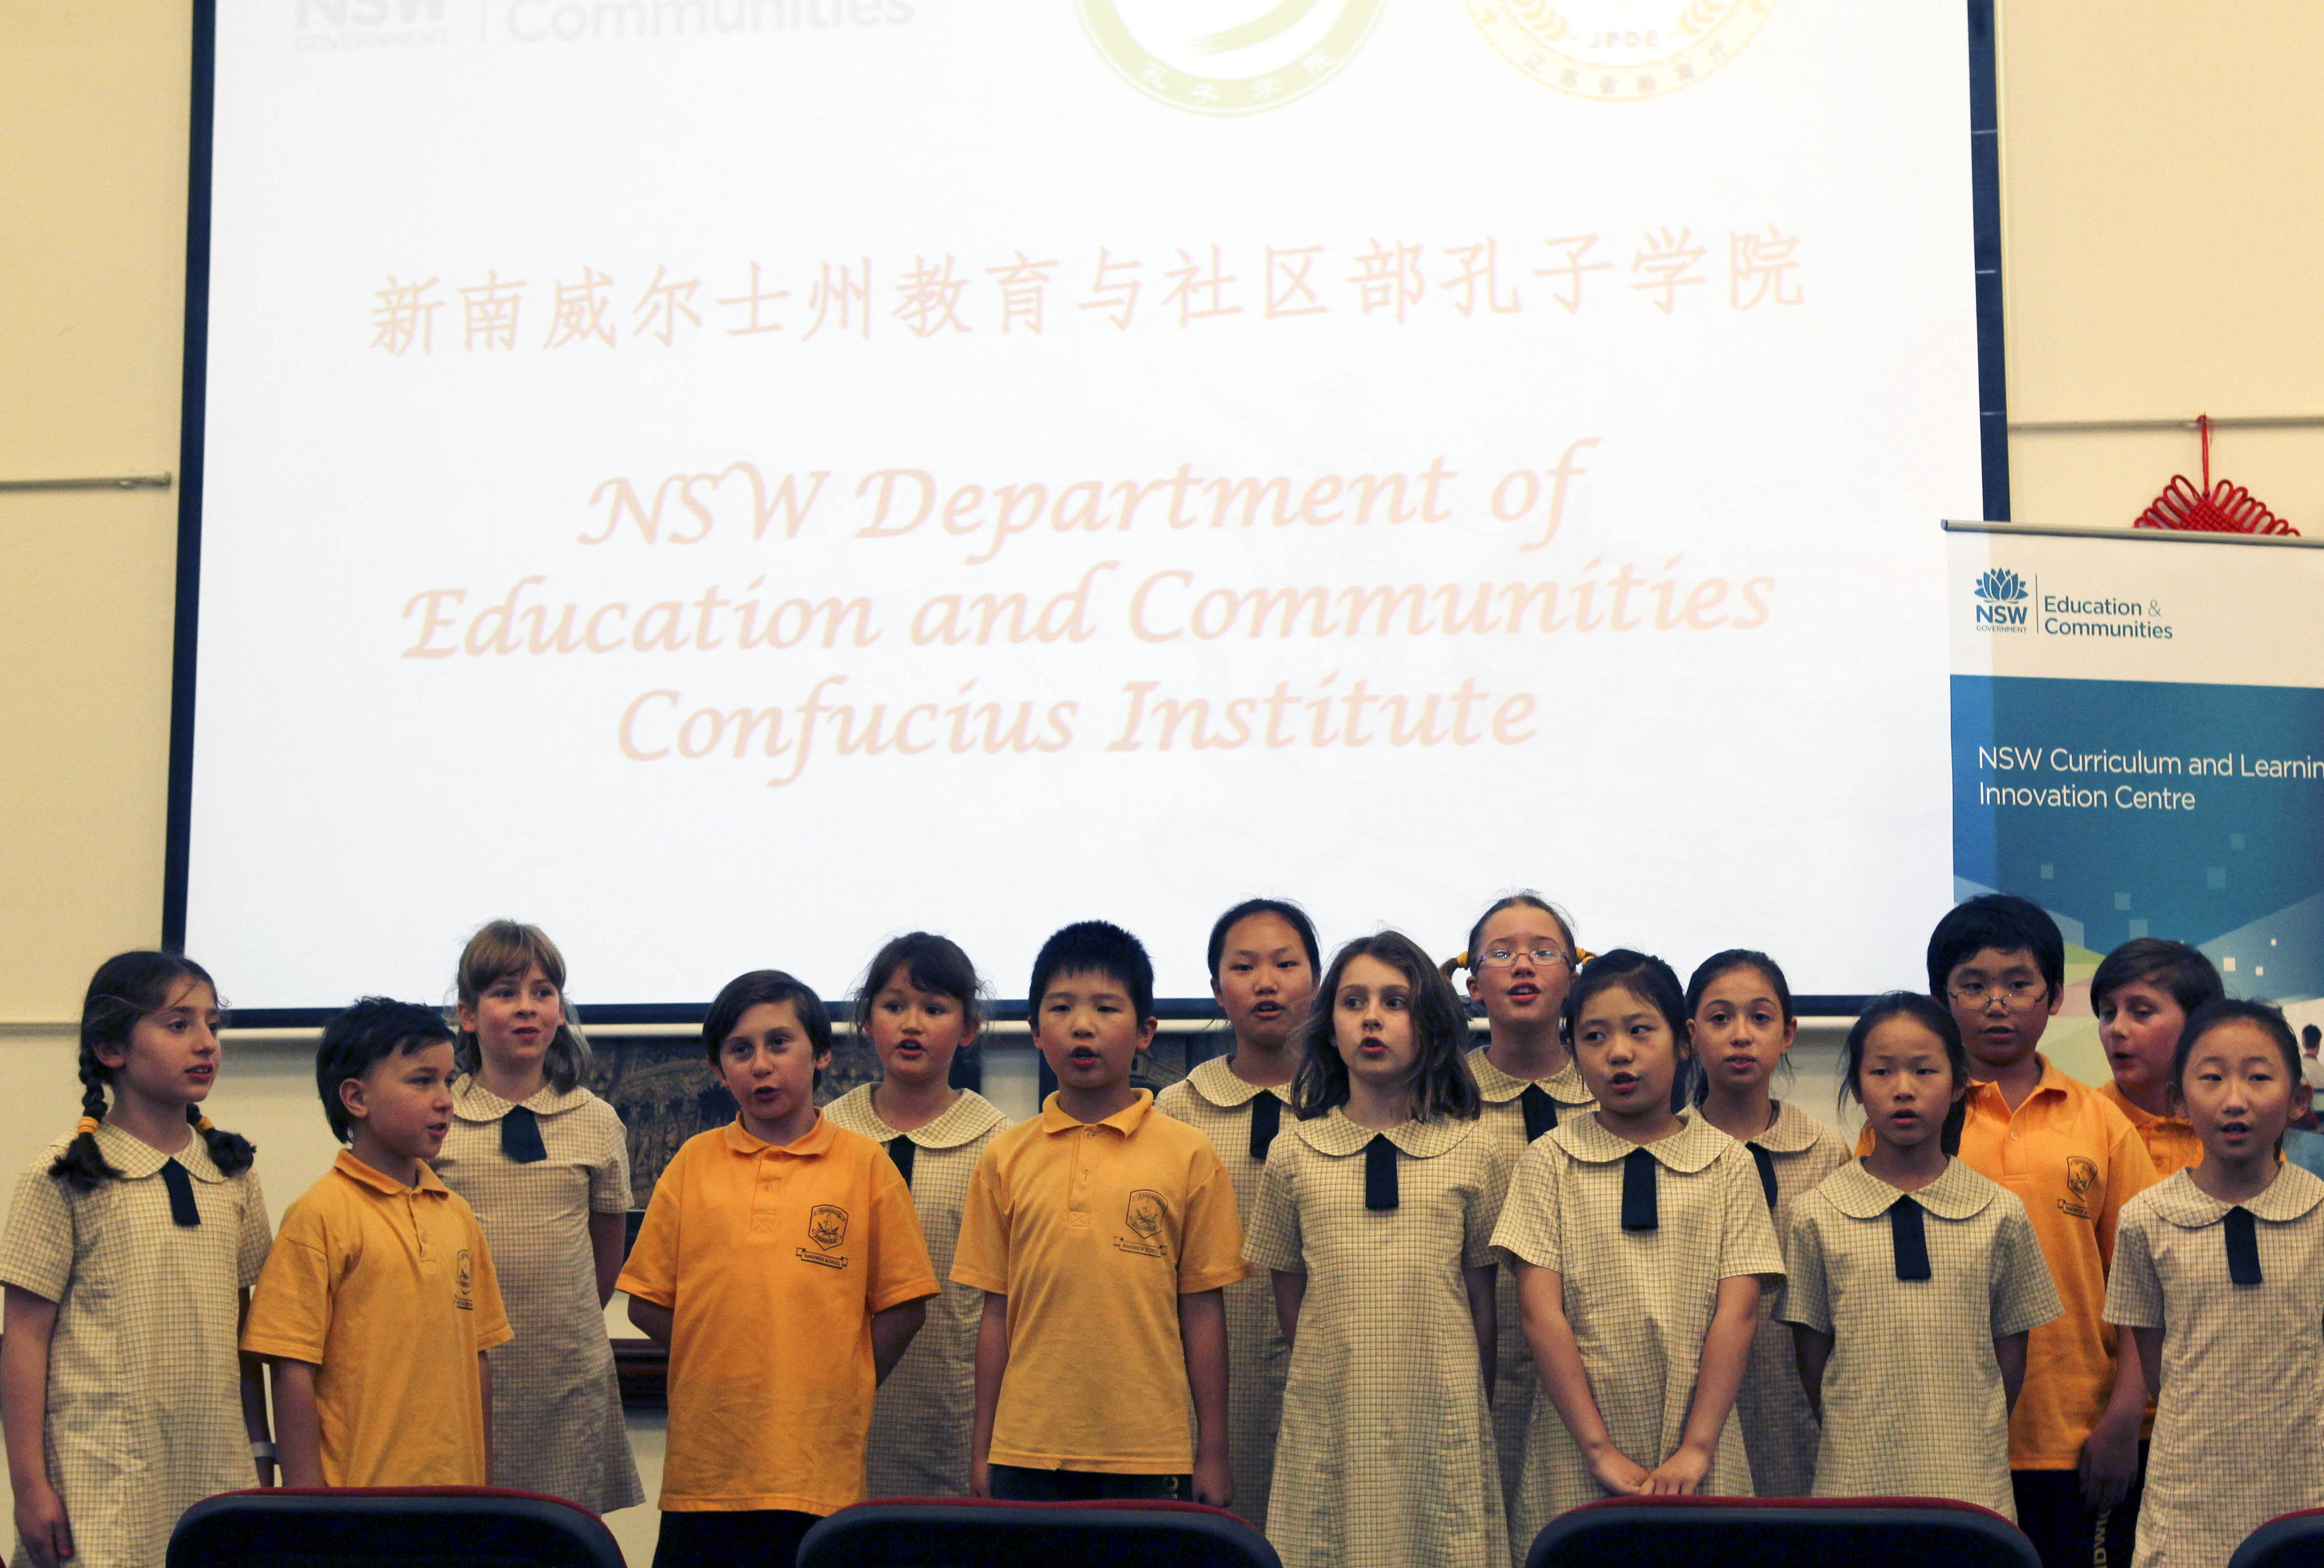 Australian universities, teachers' associations defend Confucius Institutes - Xinhua | English.news.cn